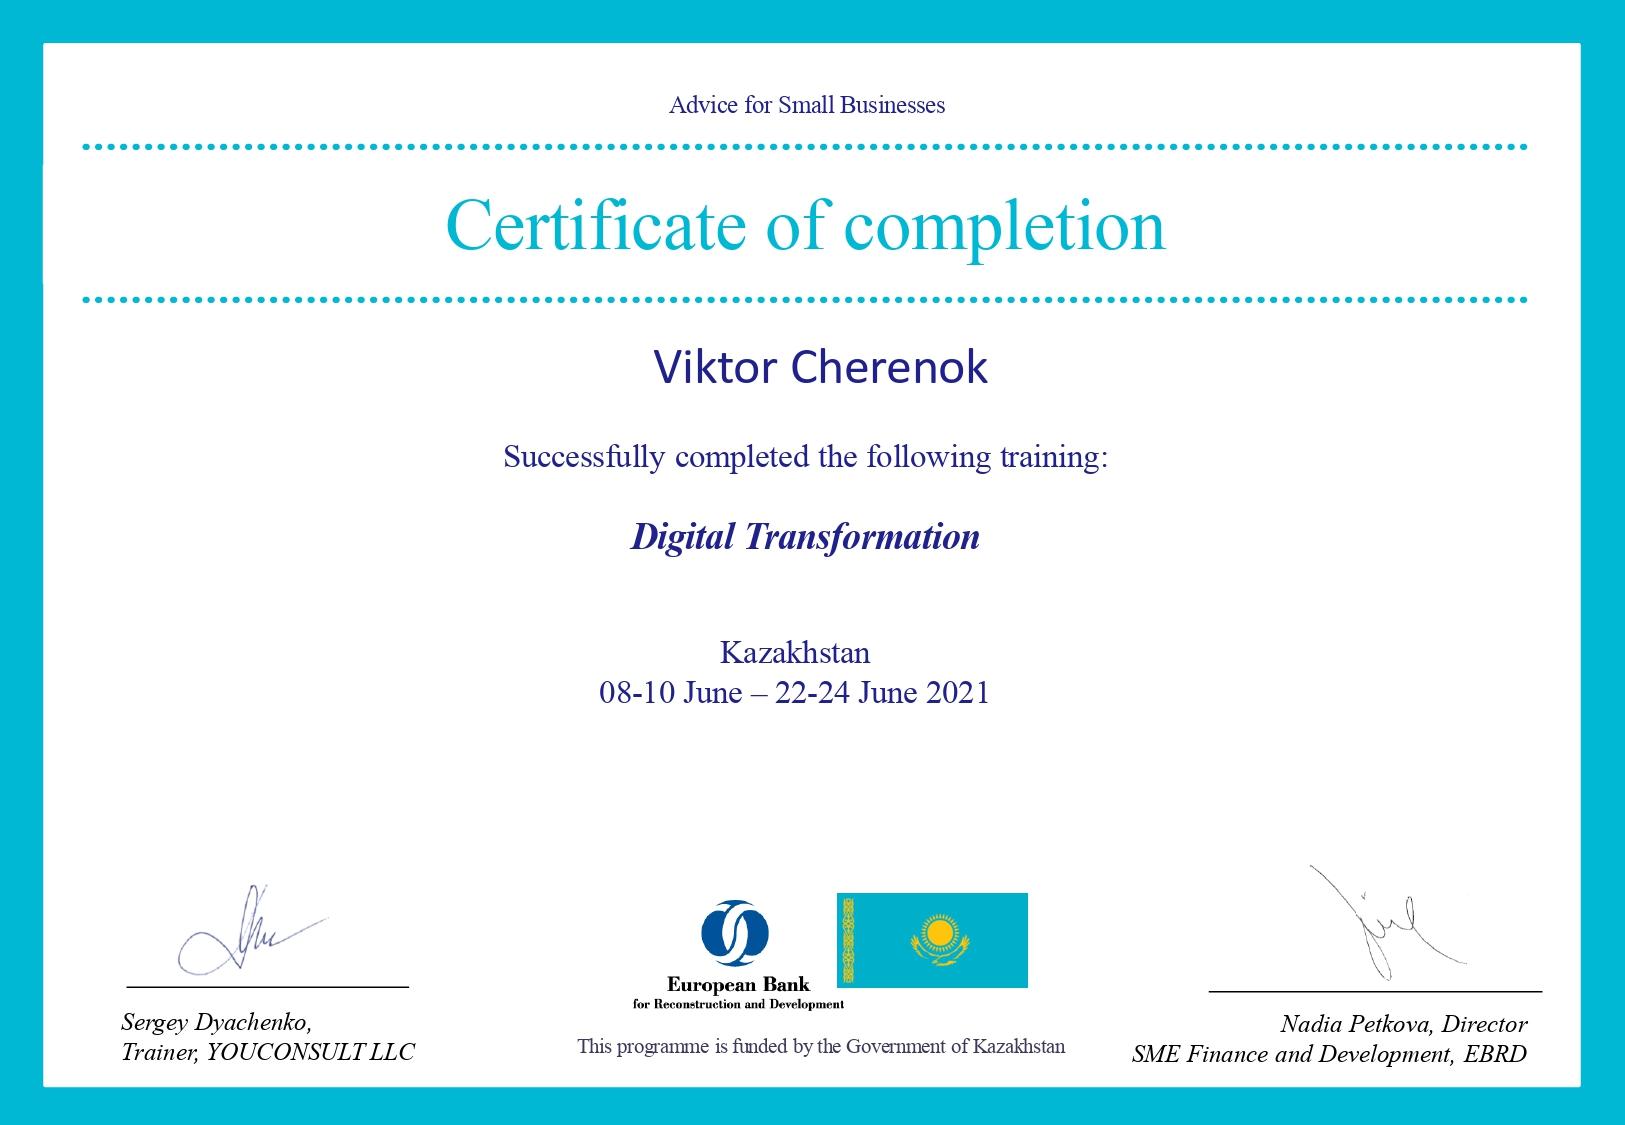 Digital Transformation certificates_signed_Viktor Cherenok_page-0001